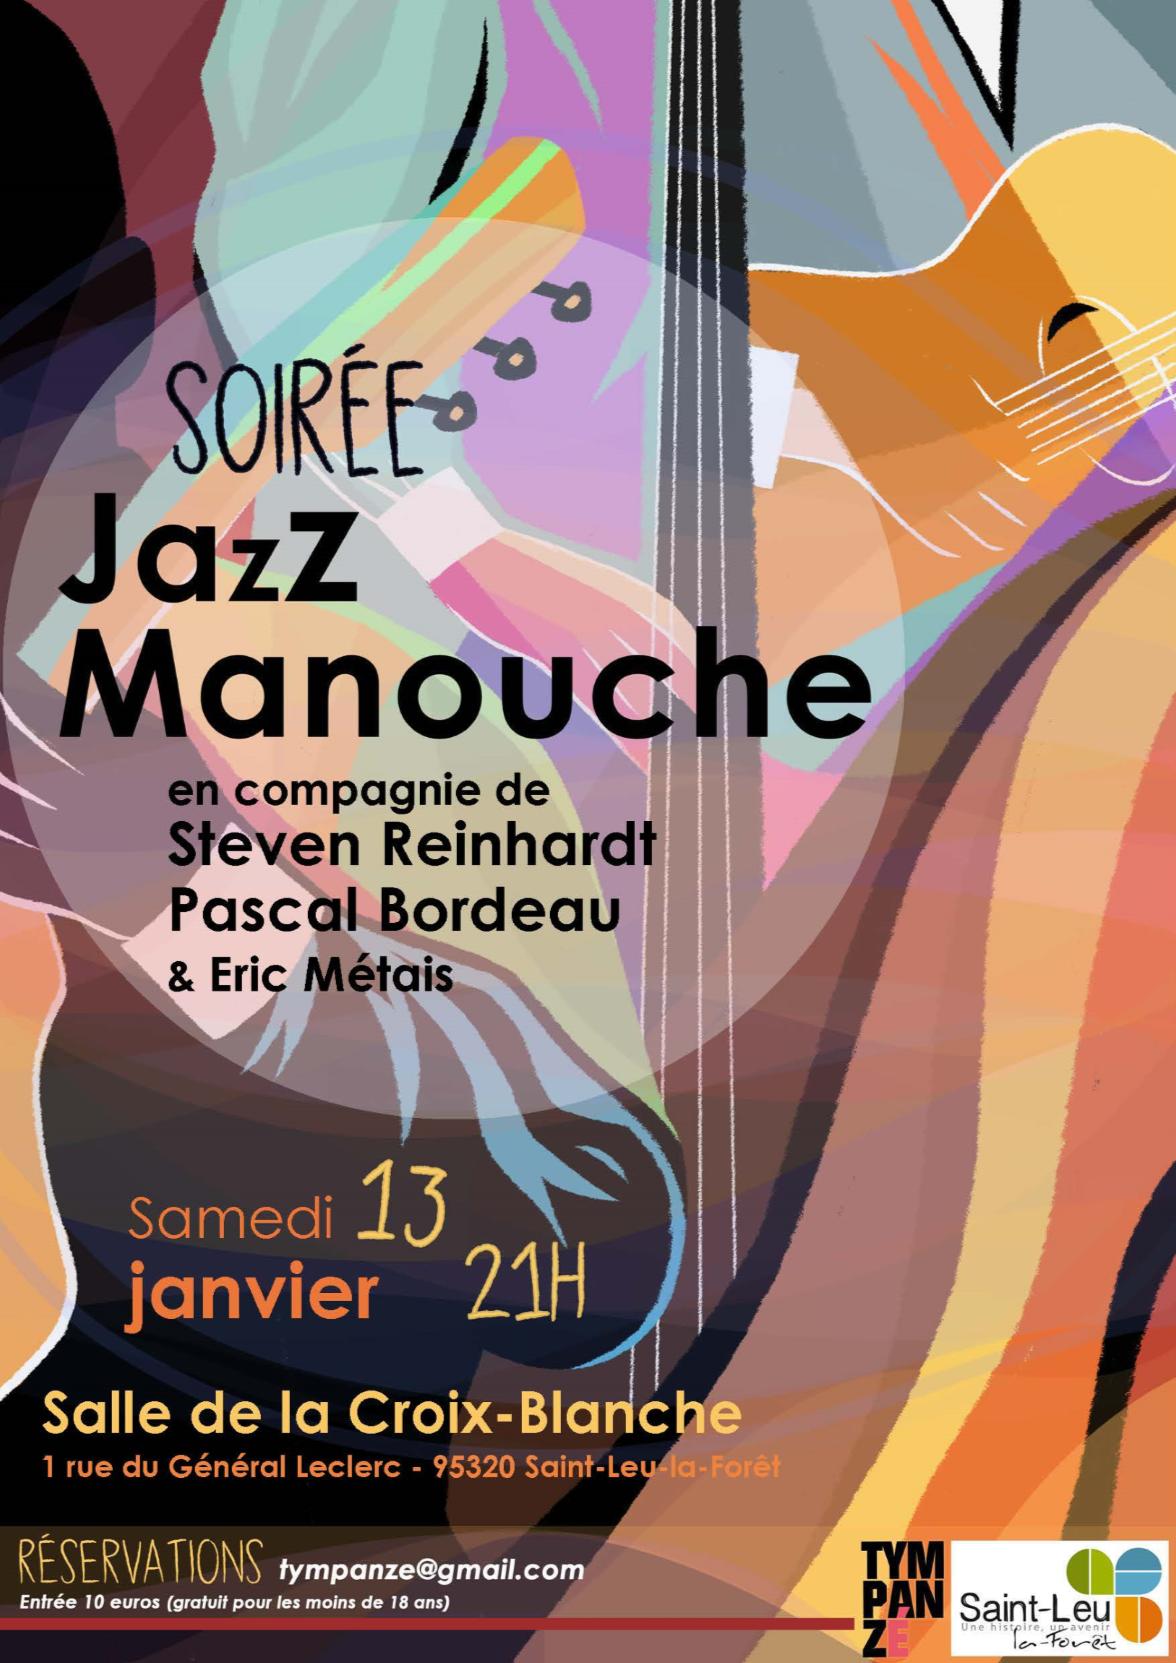 Soirée jazz manouche - 13 janvier 2018